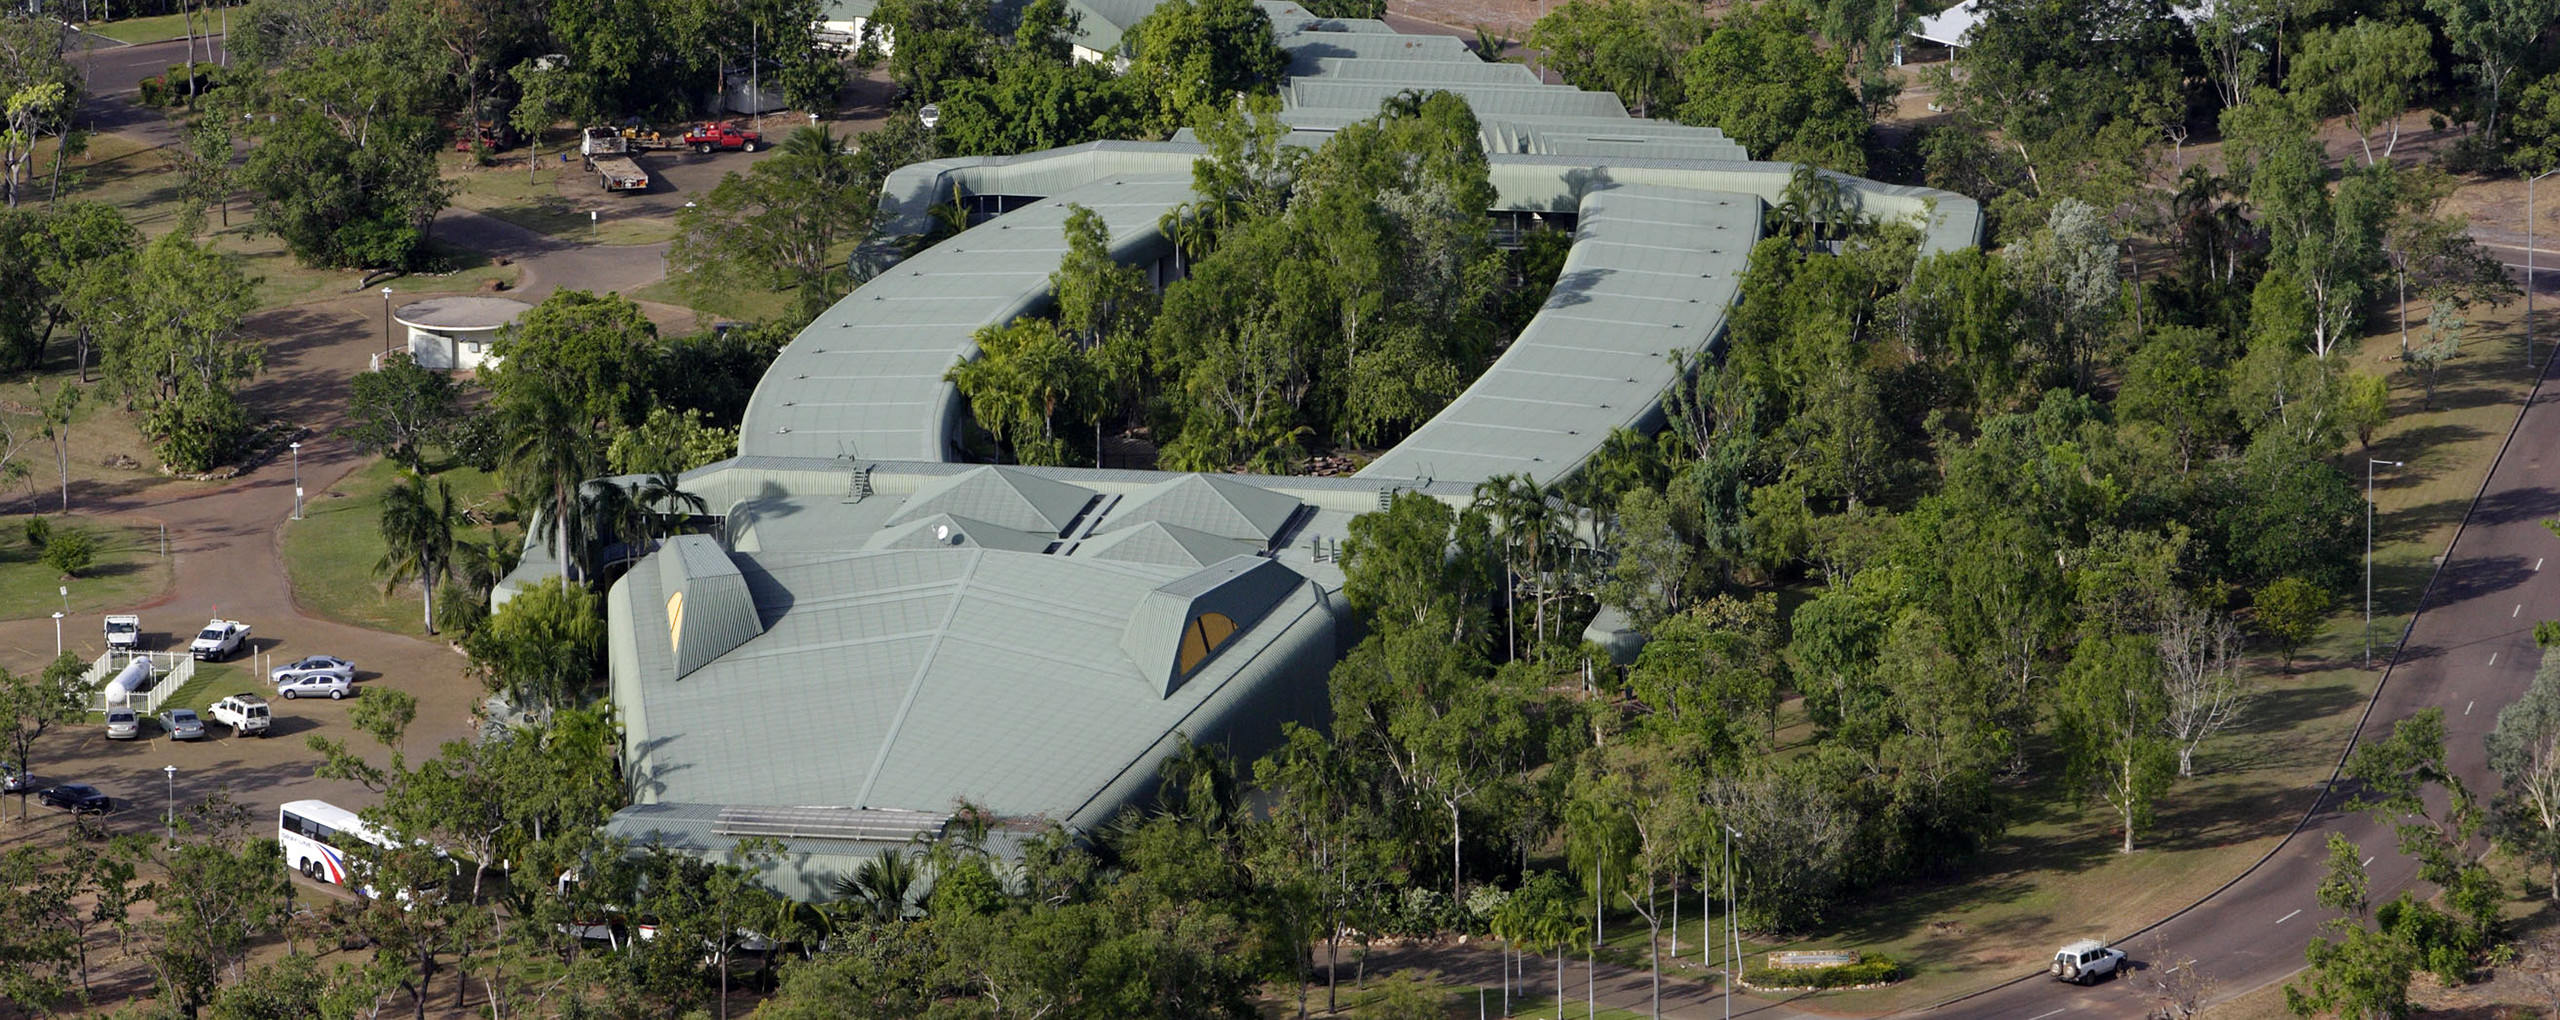 Kakadu National Park clipart #2, Download drawings